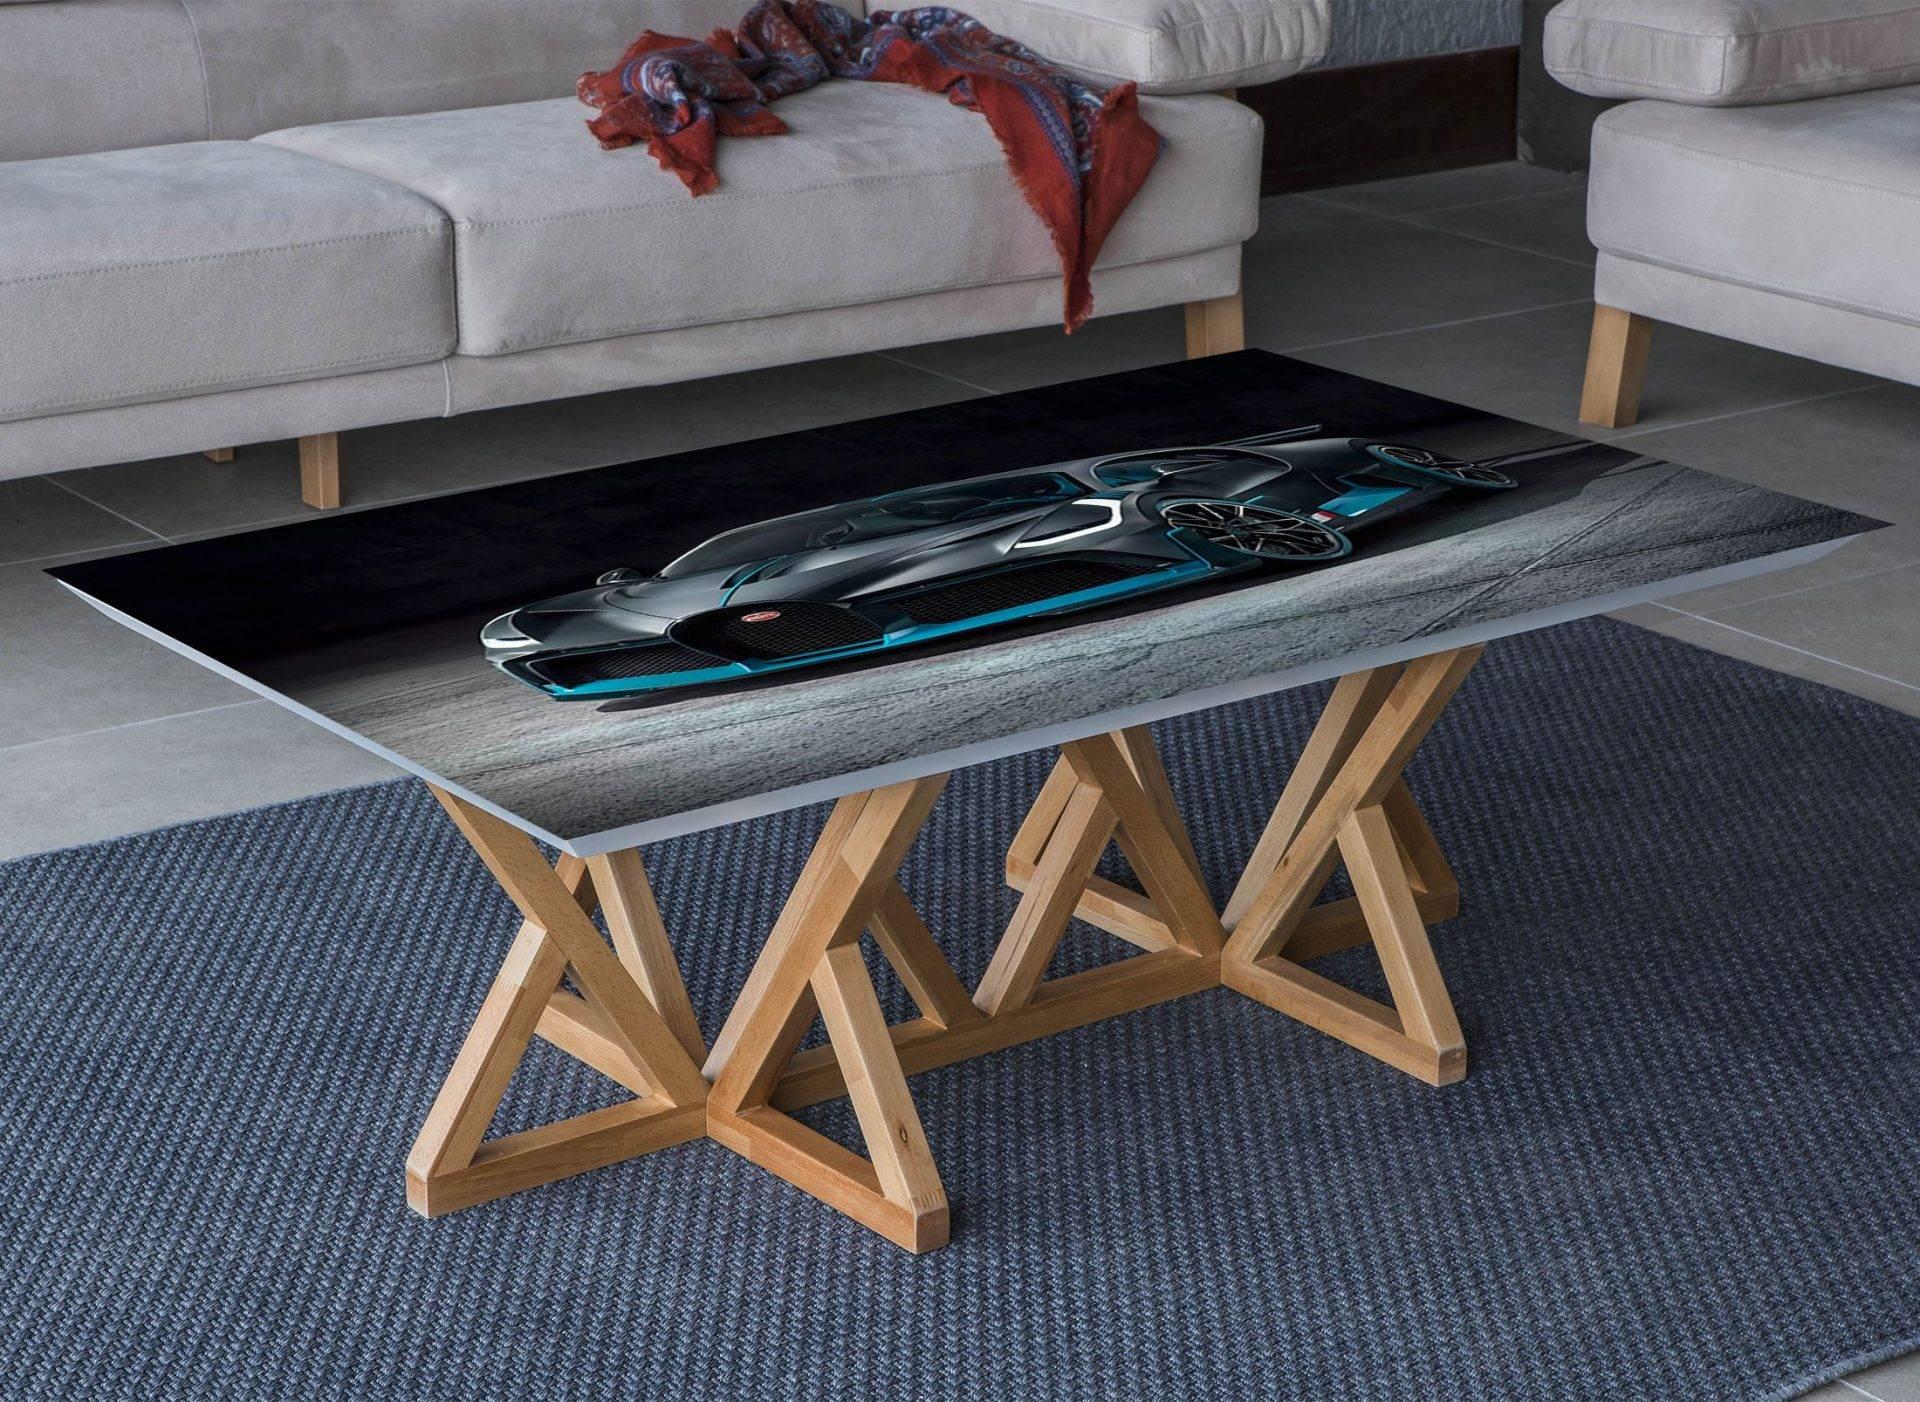 Bugatti Black Car Laminated Vinyl Cover Self-Adhesive for Desk and Tables